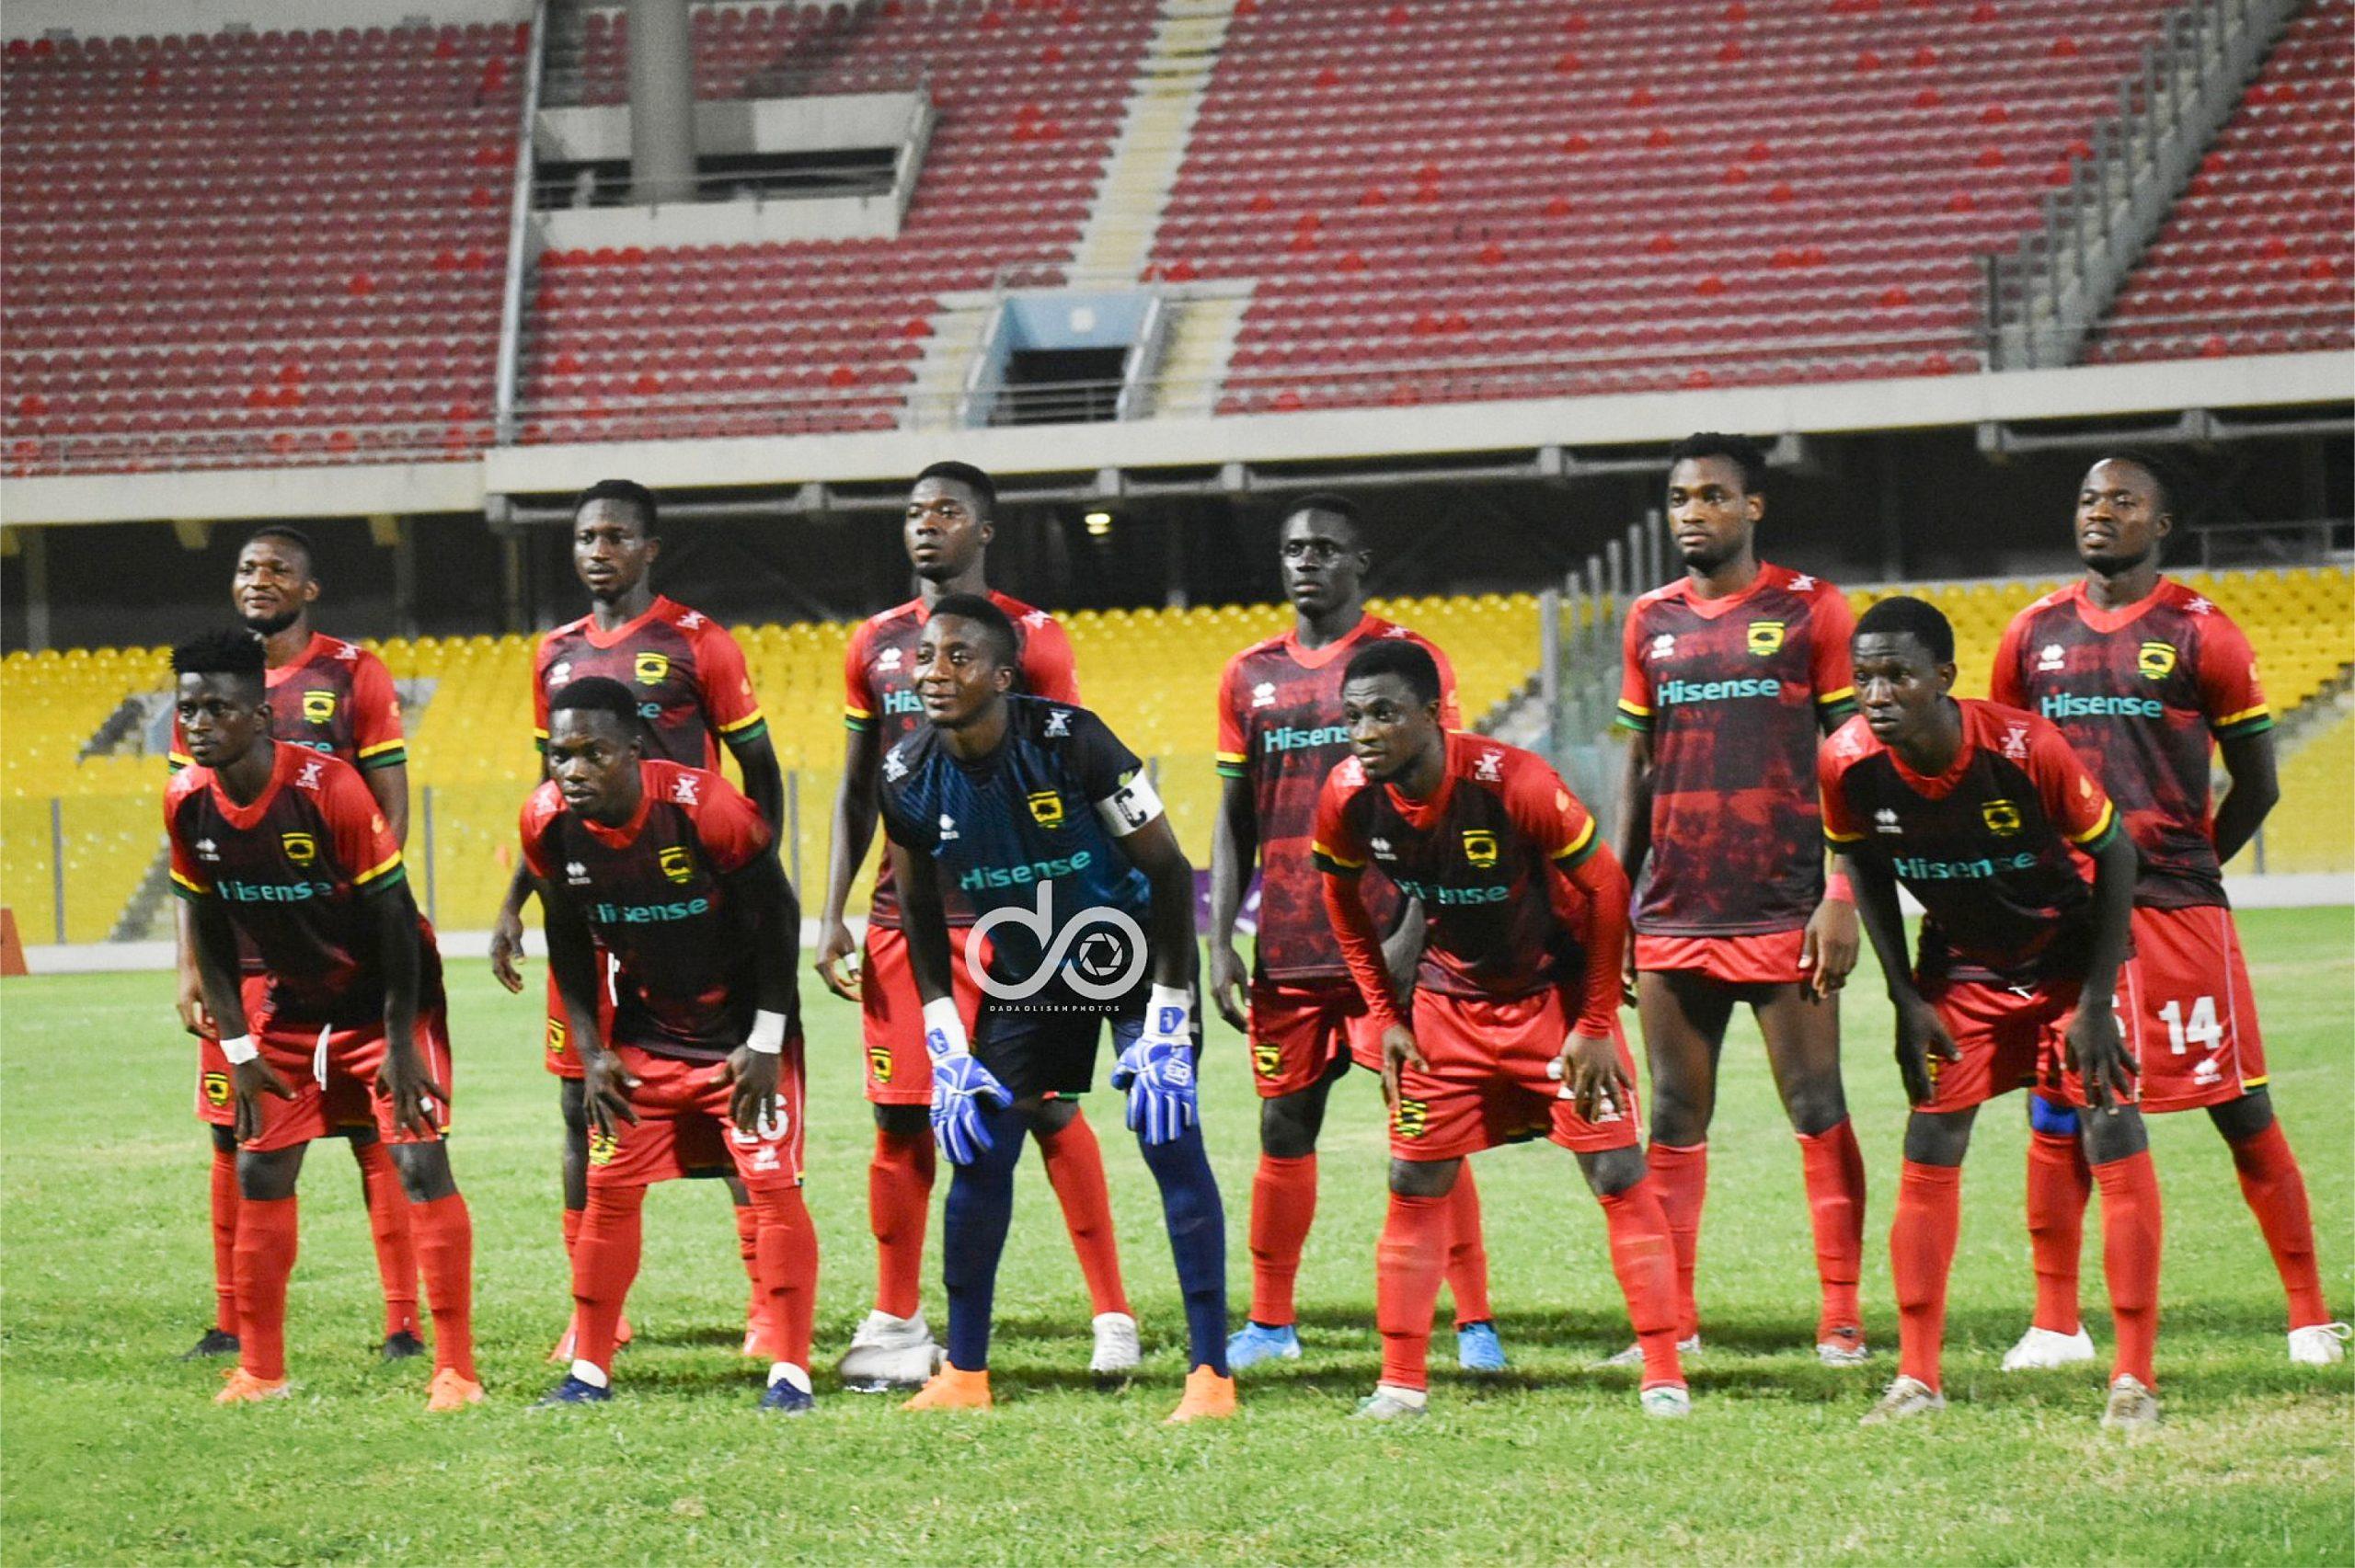 2021 Ghana Premier League: Sulley Muniru and Kwame Frimpong to miss Kotoko's game against Ebusua Dwarfs